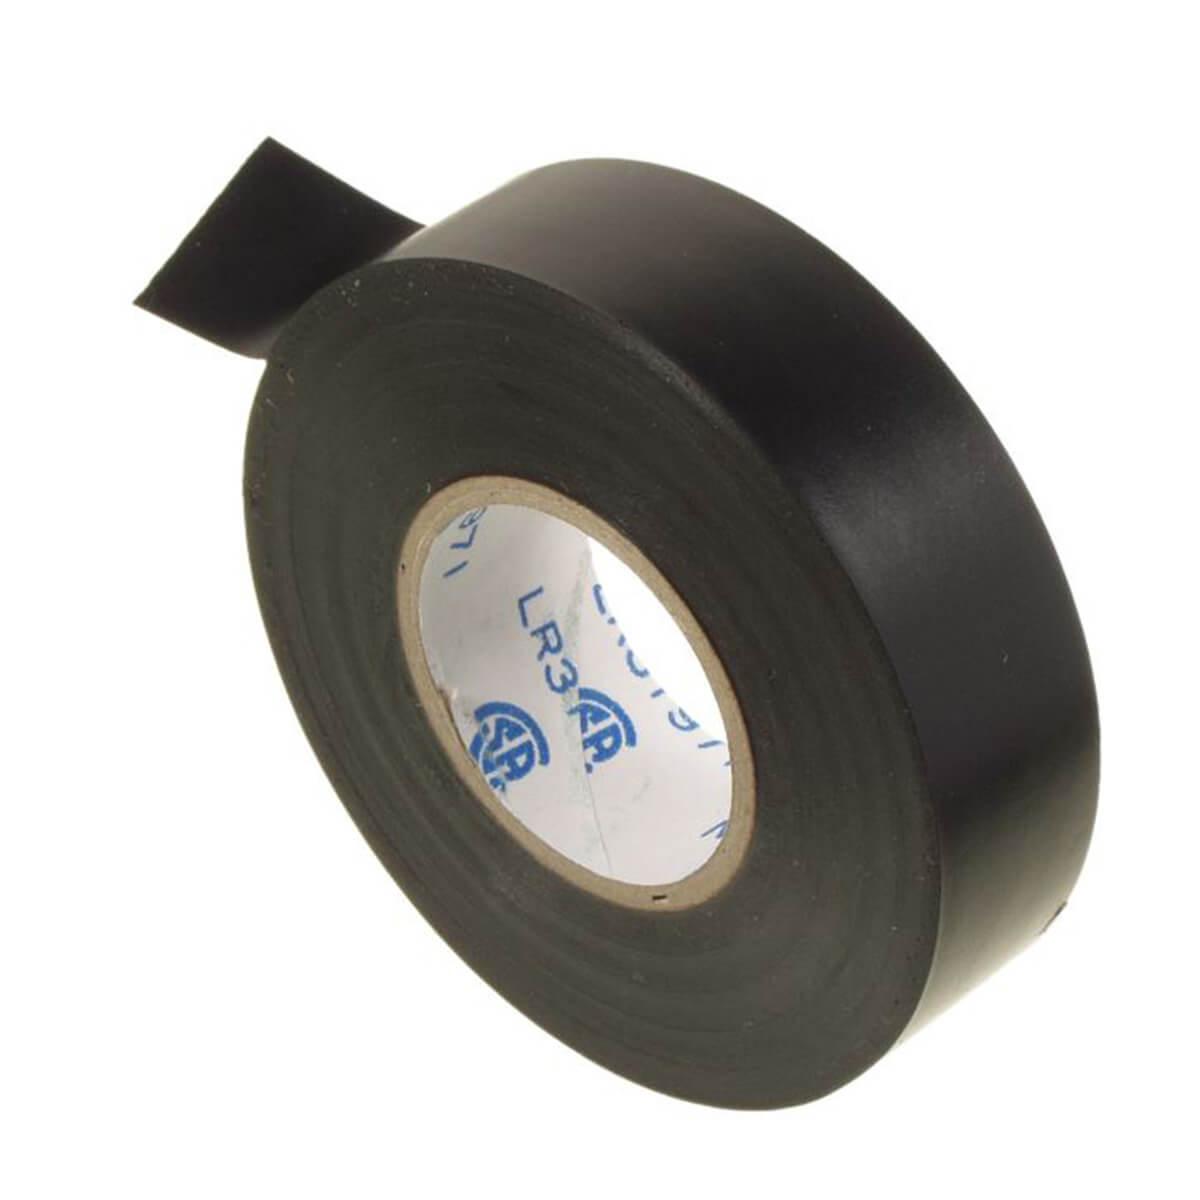 General Purpose Vinyl Electrical Tape - 3/4-in x 60-ft